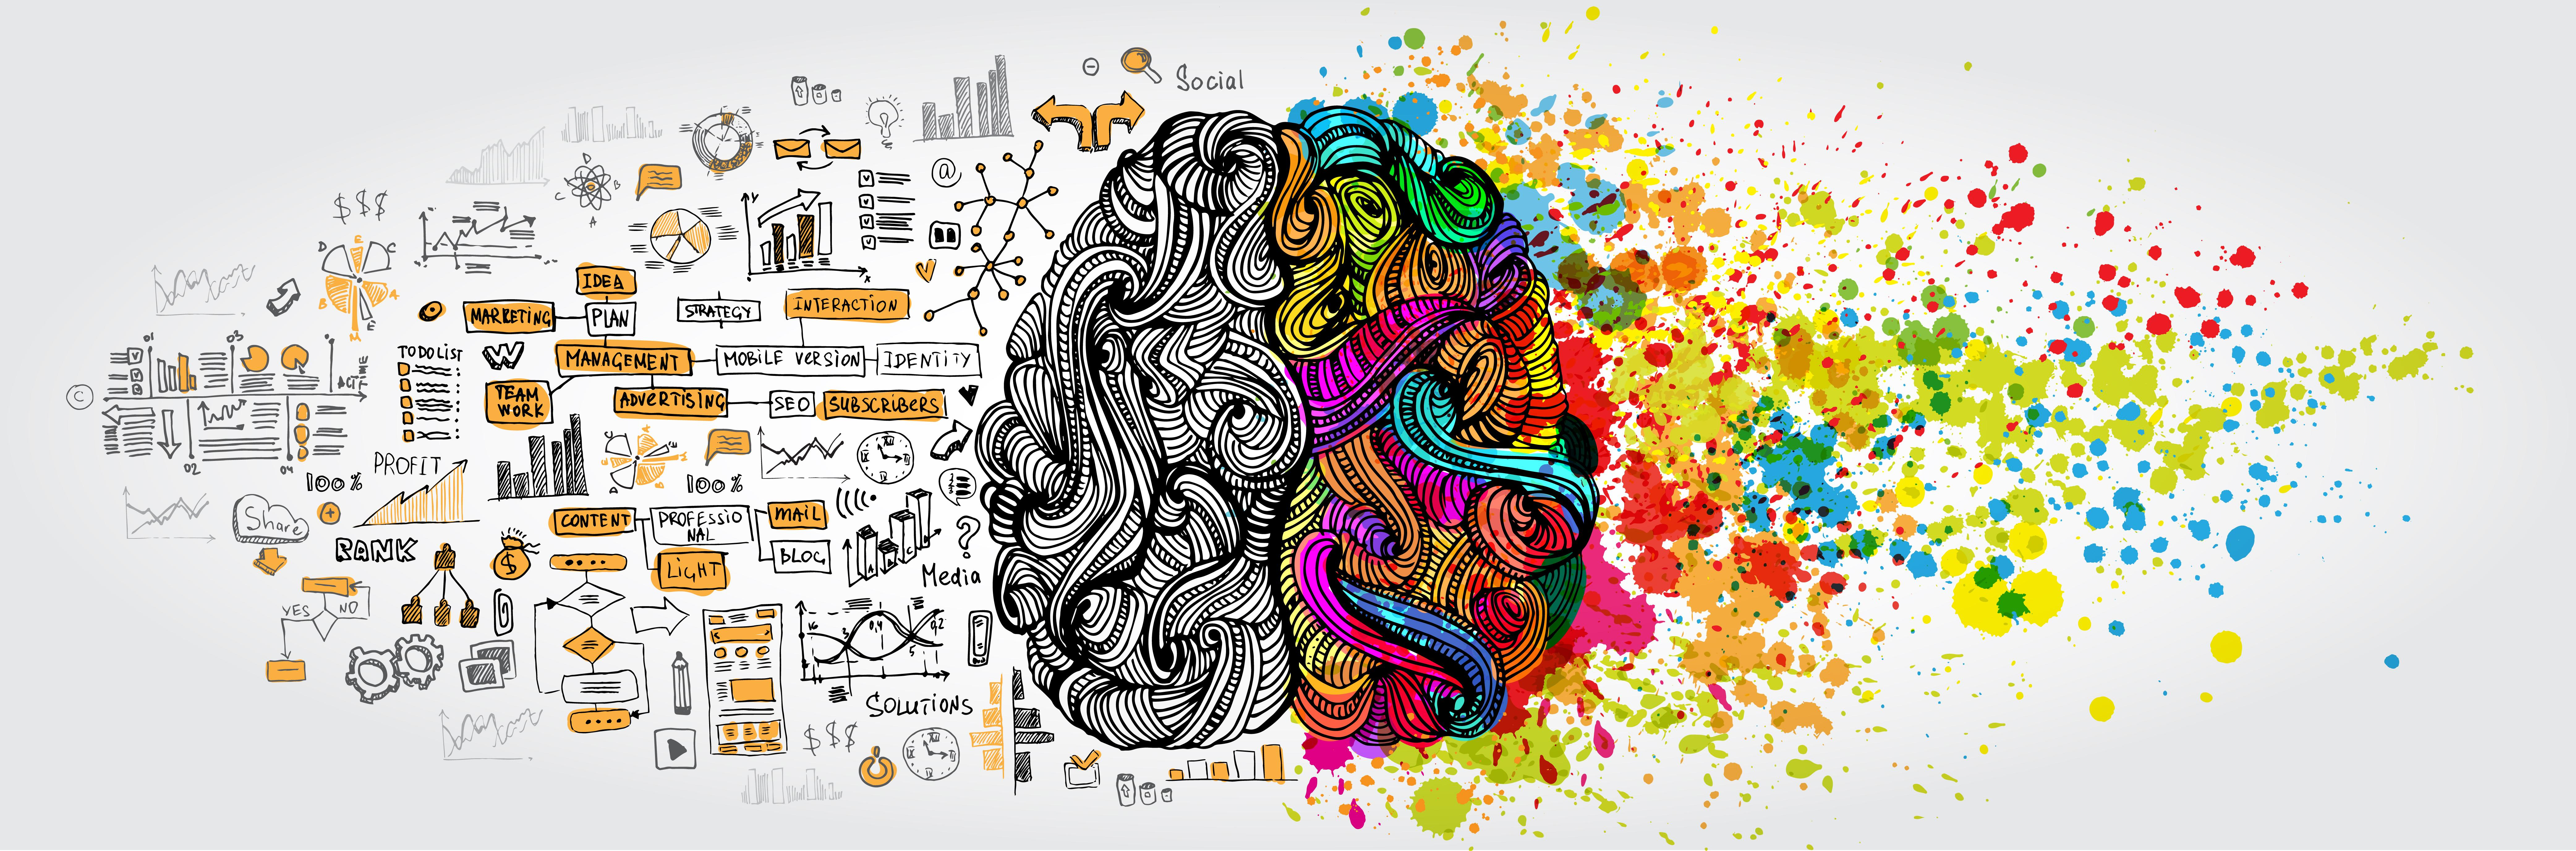 Creativity - The Wow Factor !